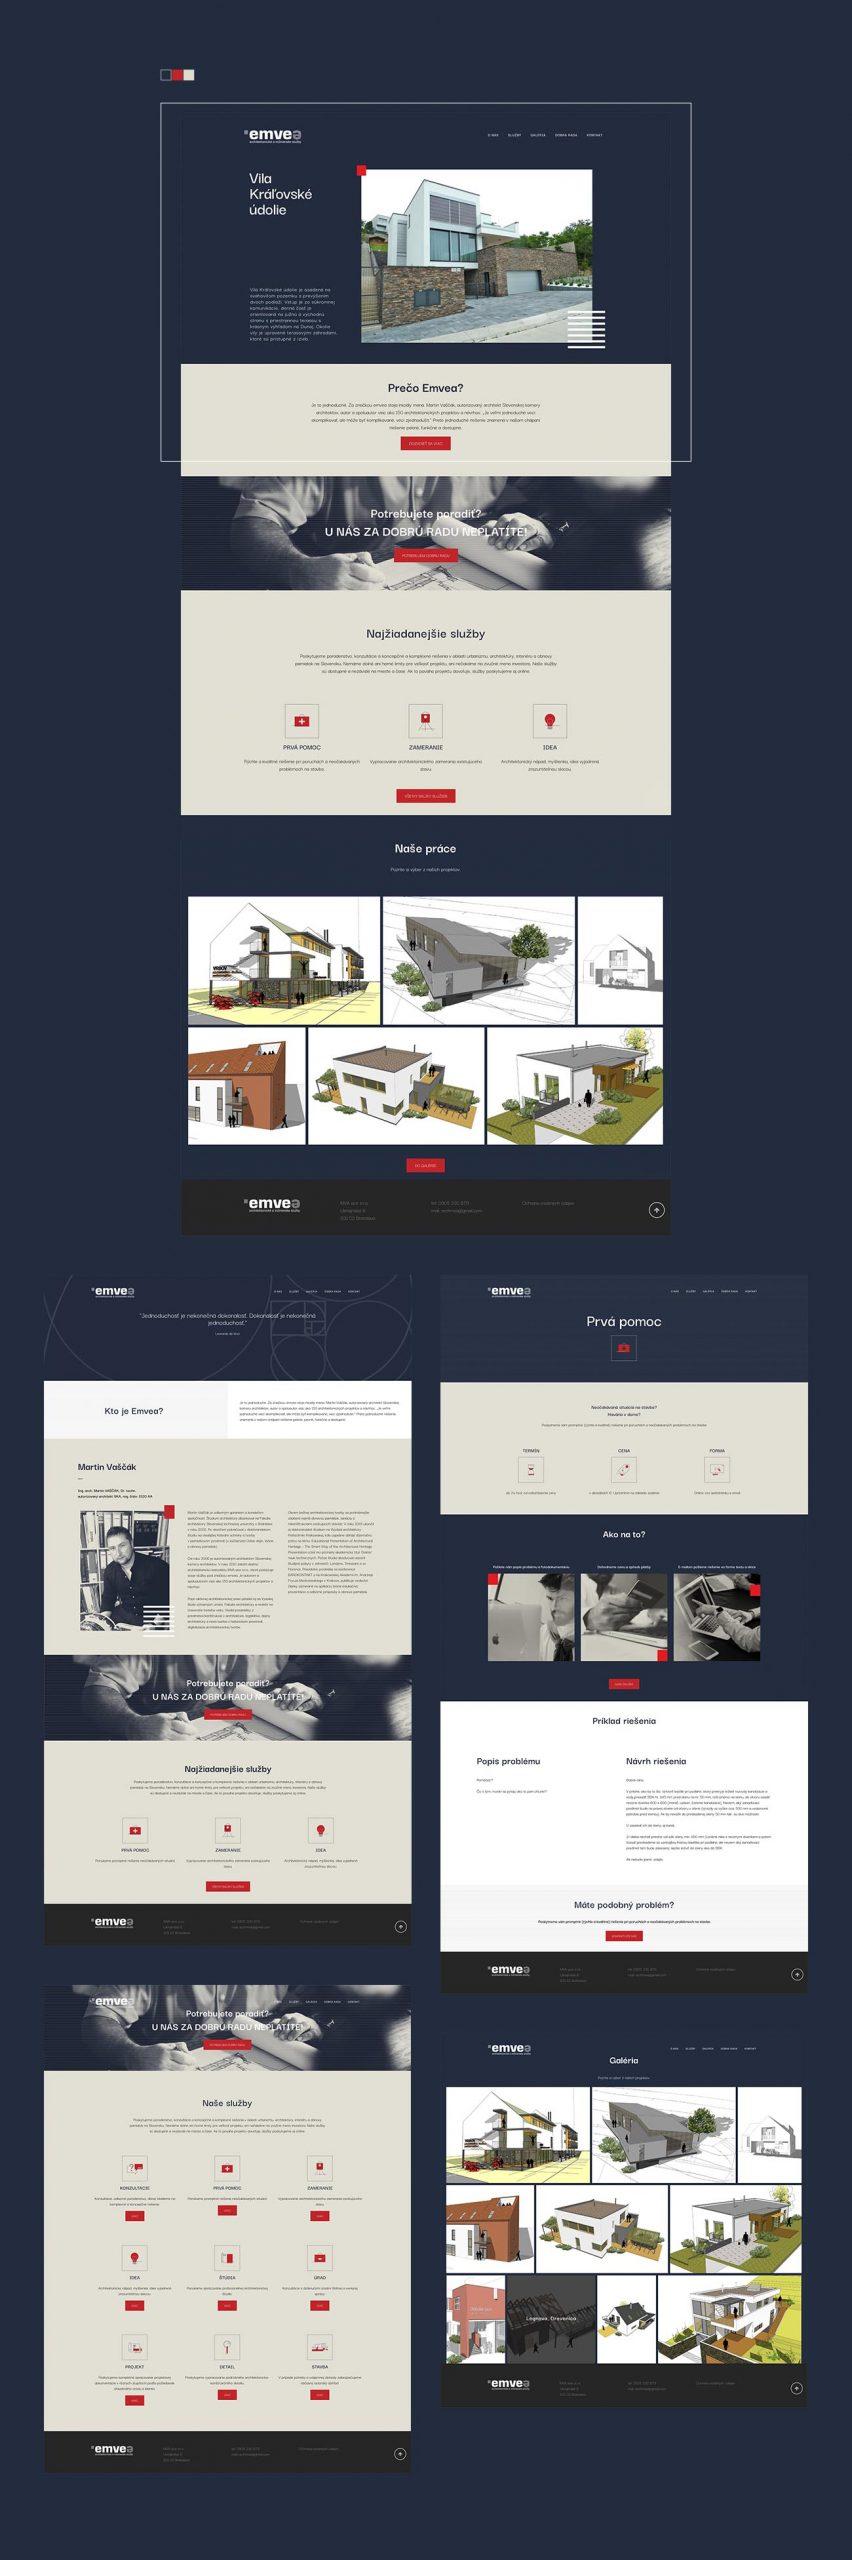 emvea cubestudio portfolio 1 copy